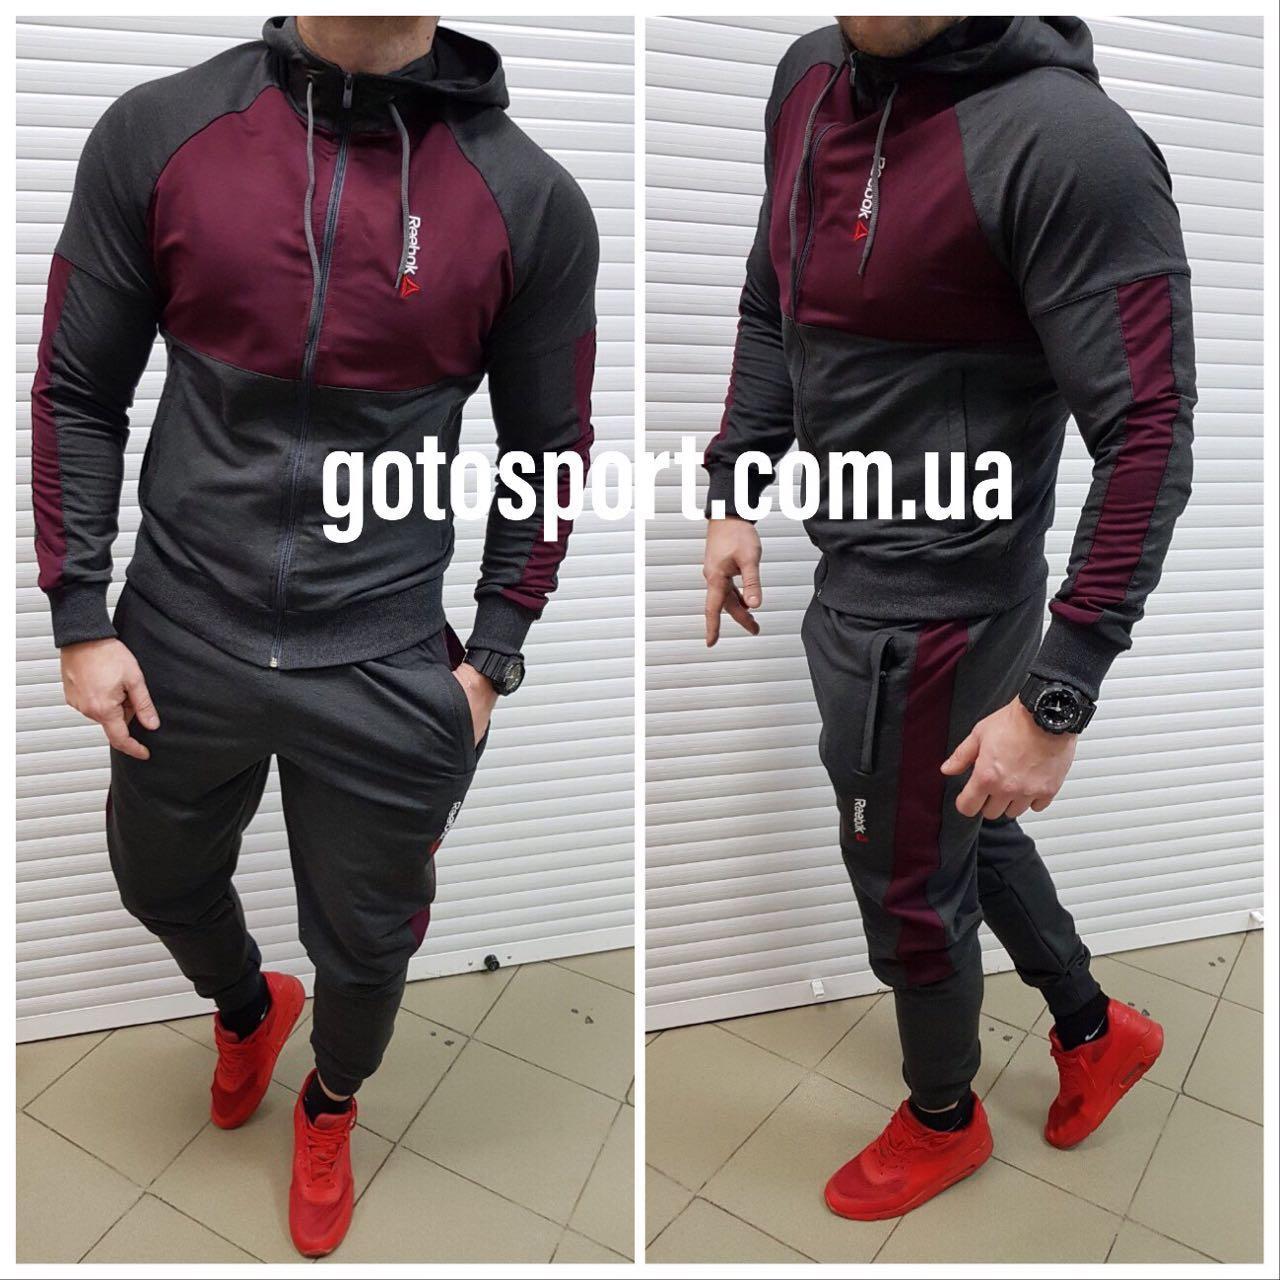 73f92ad0 Мужской спортивный костюм Reebok Hercules бордо: продажа, цена в ...